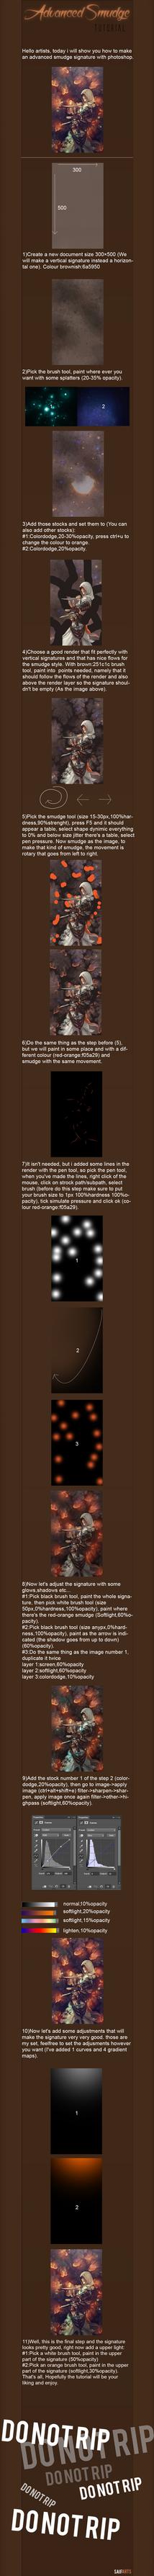 Advanced Smudge Tutorial by SaifArts